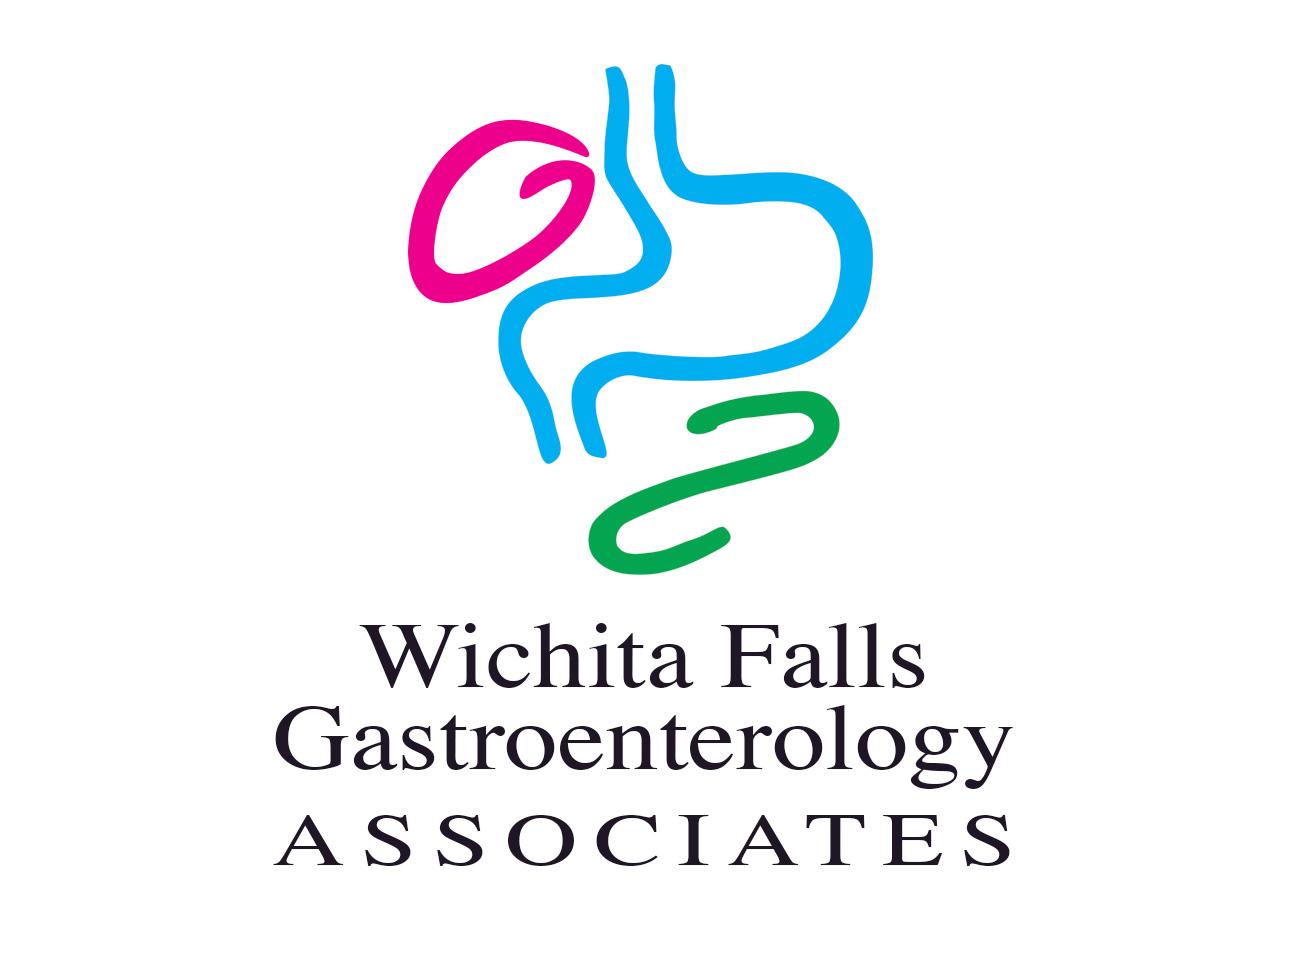 Wichita Falls Gastroenterology Associates, Logo Design